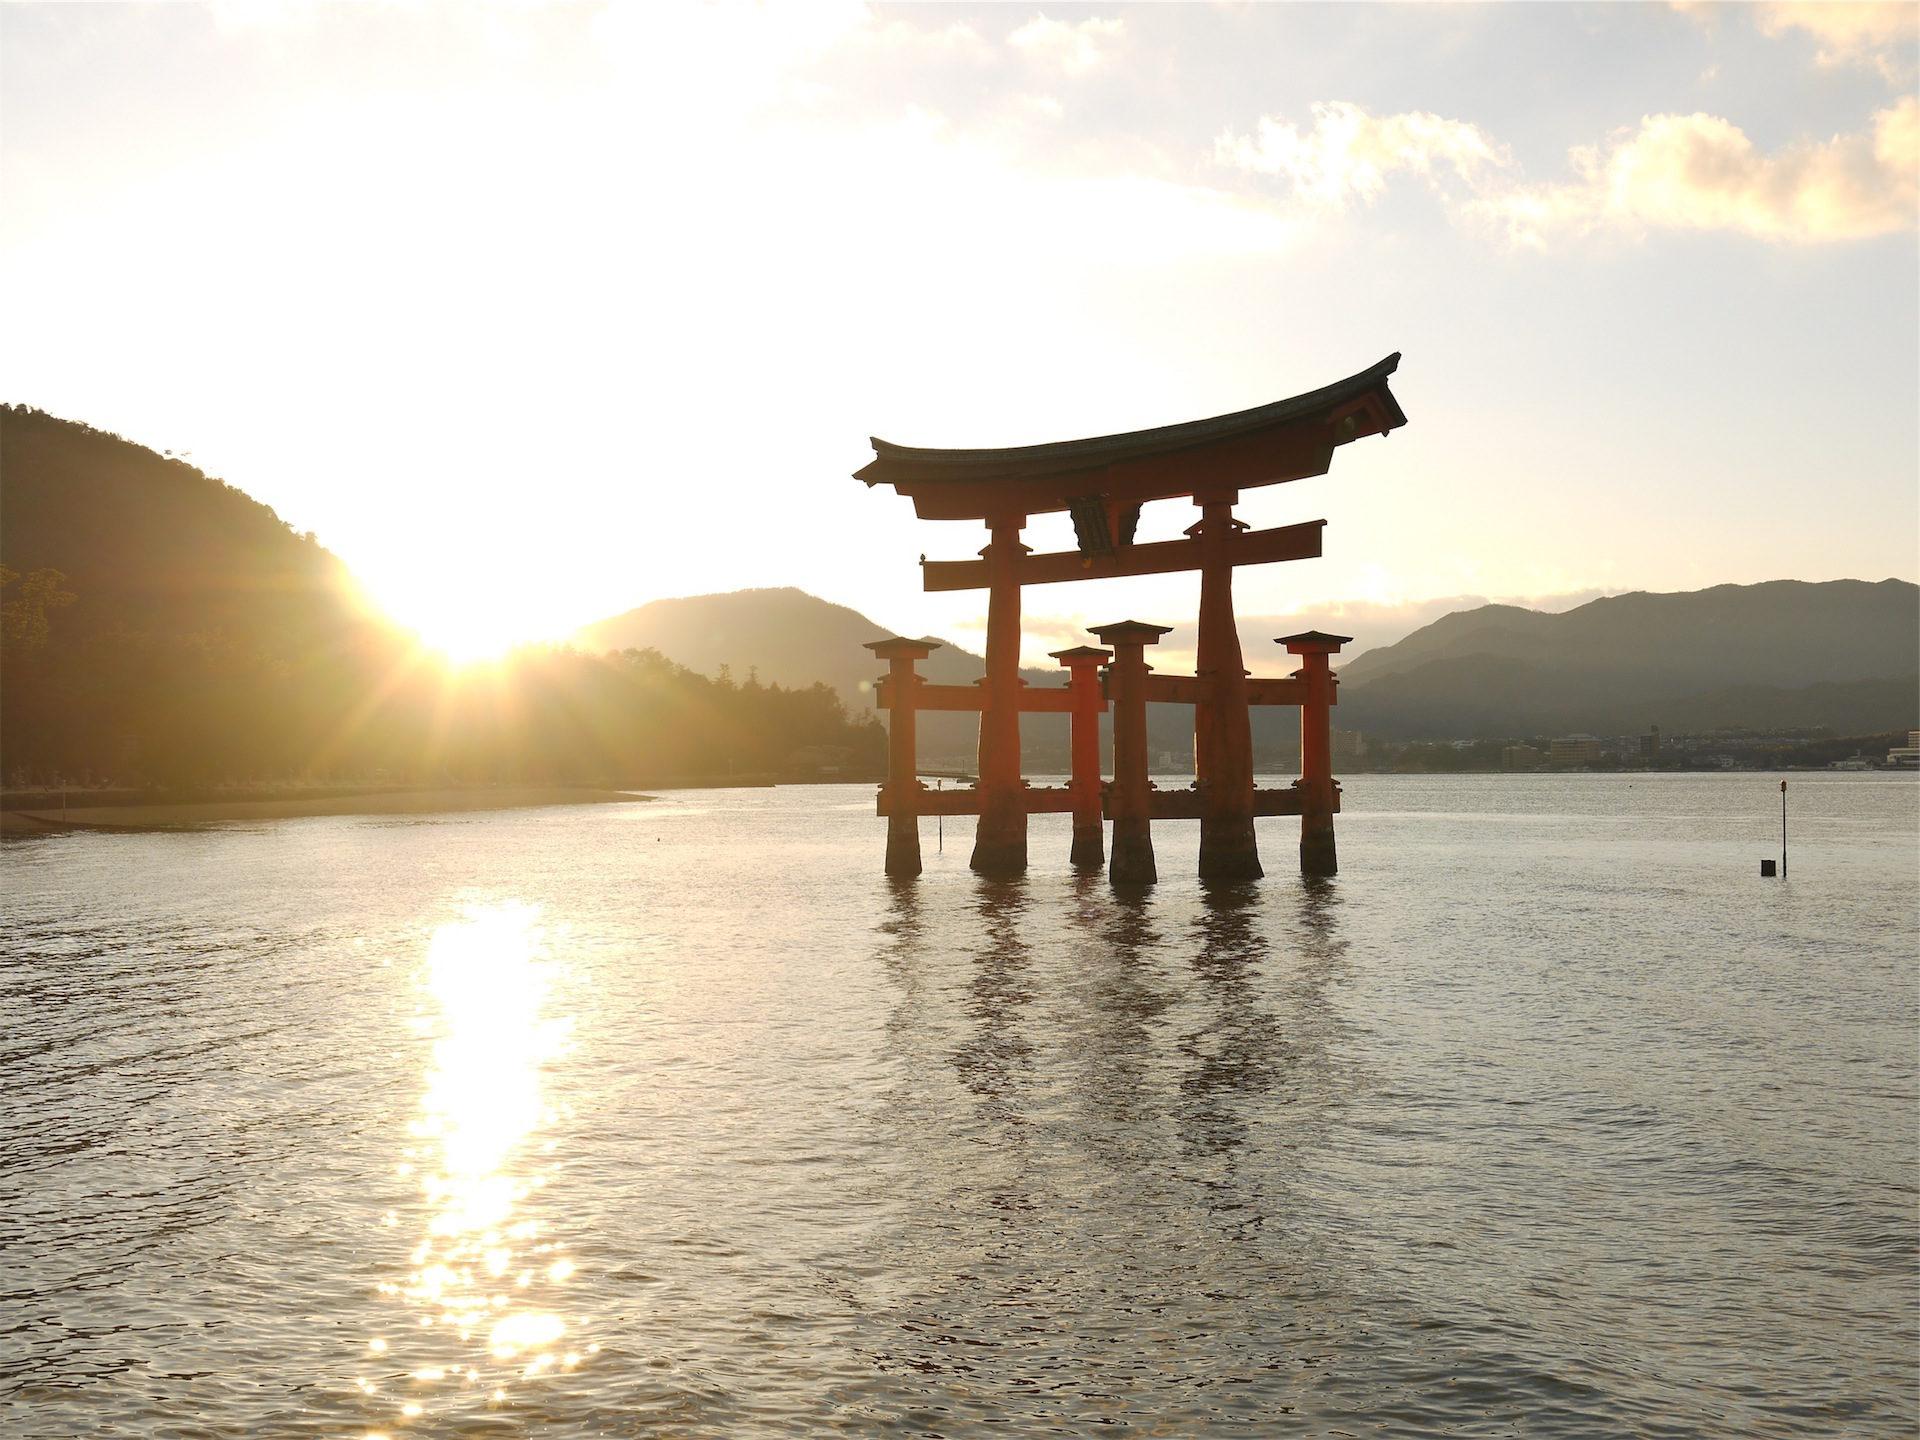 Lake, Skulptur, Japan, Sonne, steigt - Wallpaper HD - Prof.-falken.com